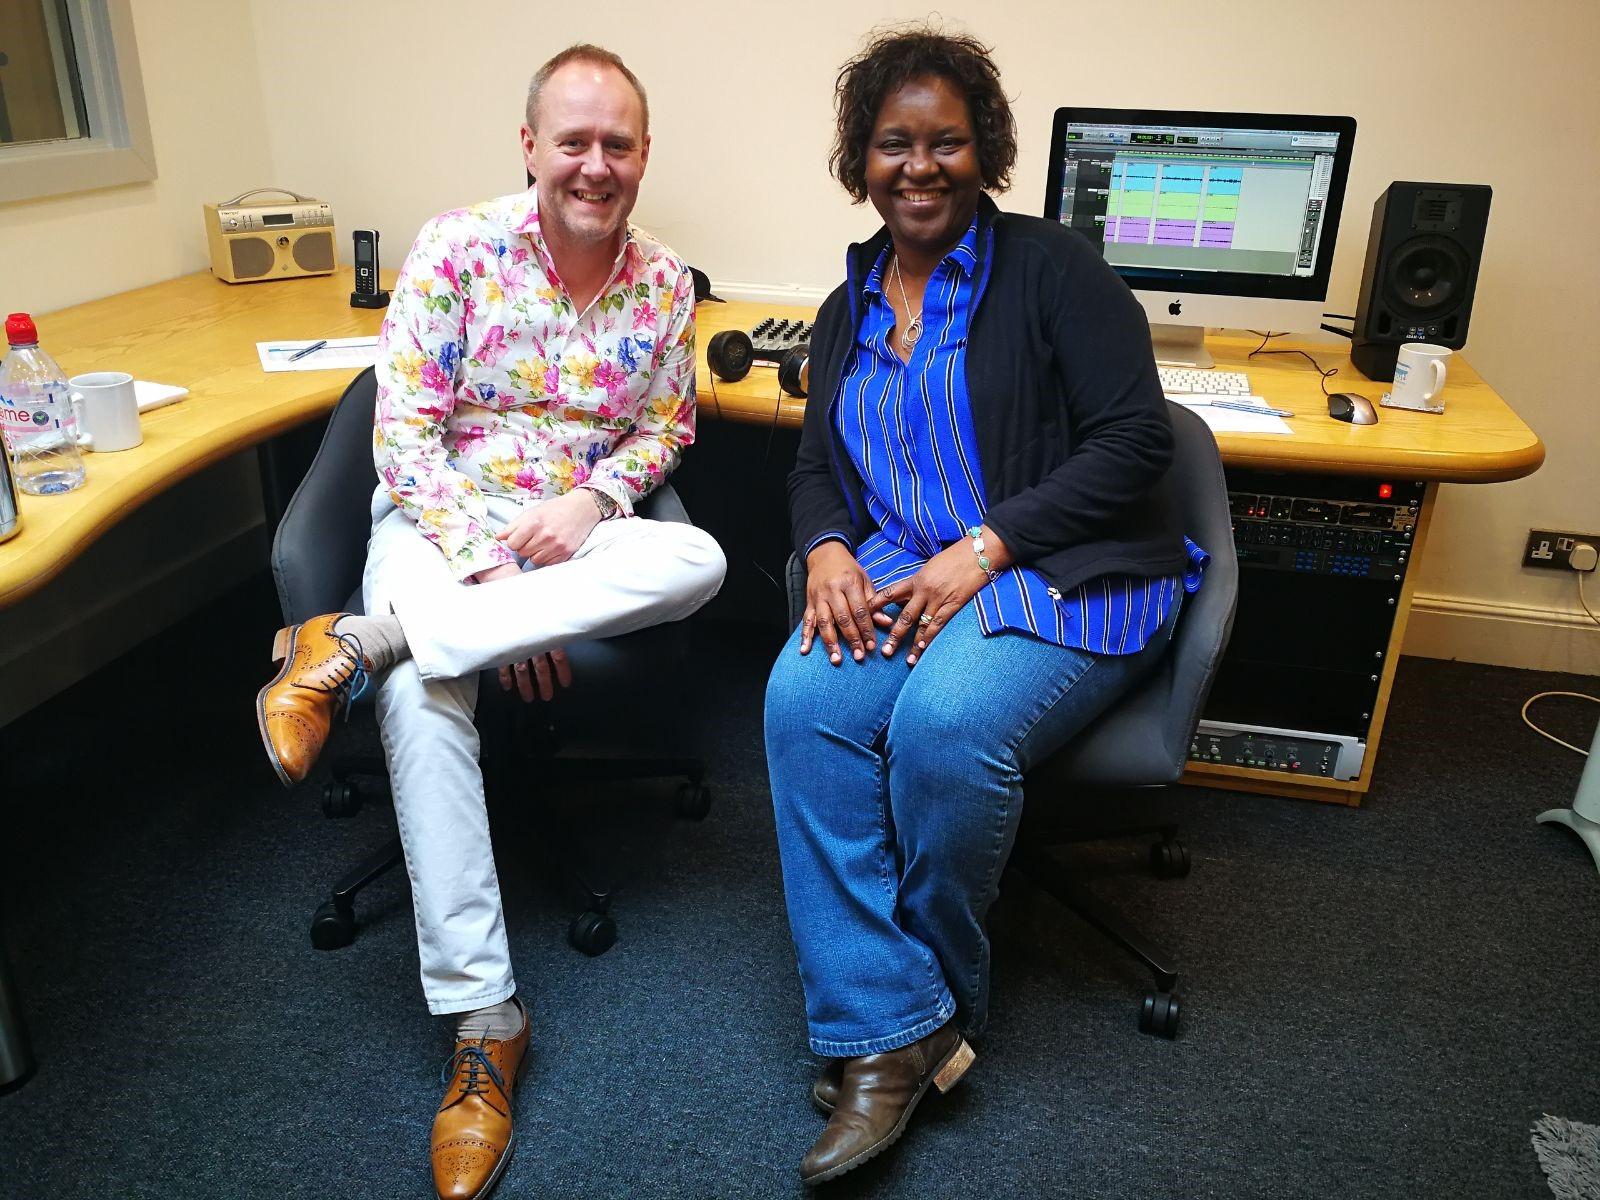 Mr James Halstead and Plaxy Budzinska on the air